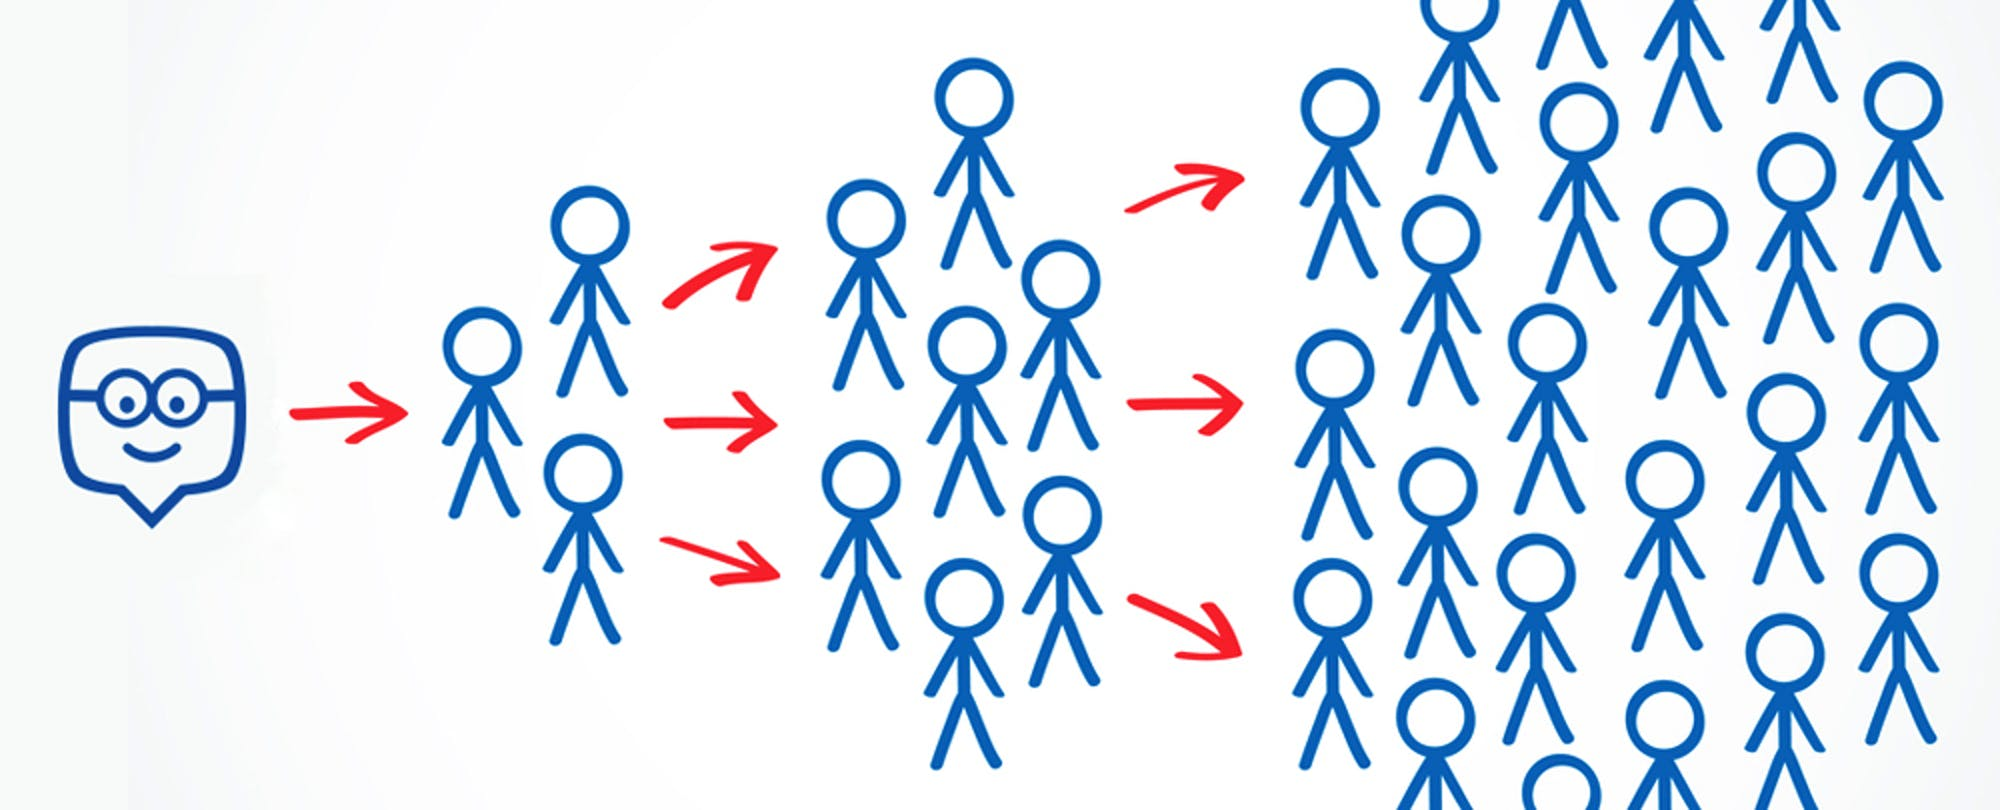 Can Edmodo Turn Virality into Profitability?